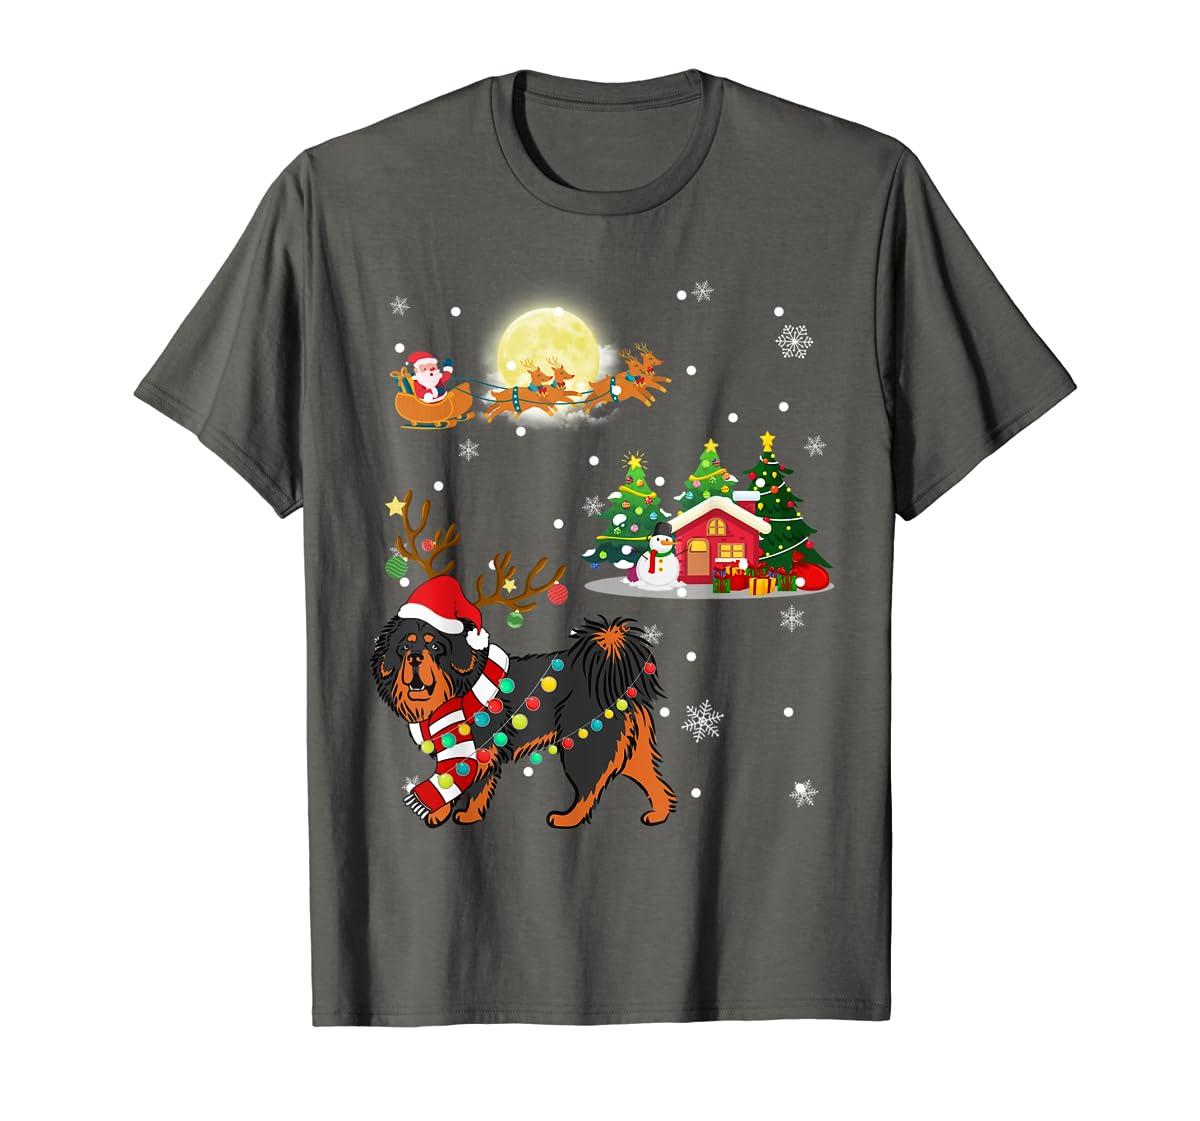 Tibetan Mastiff Dog Led Light Christmas 2019 Gift T-Shirt-Men's T-Shirt-Dark Heather